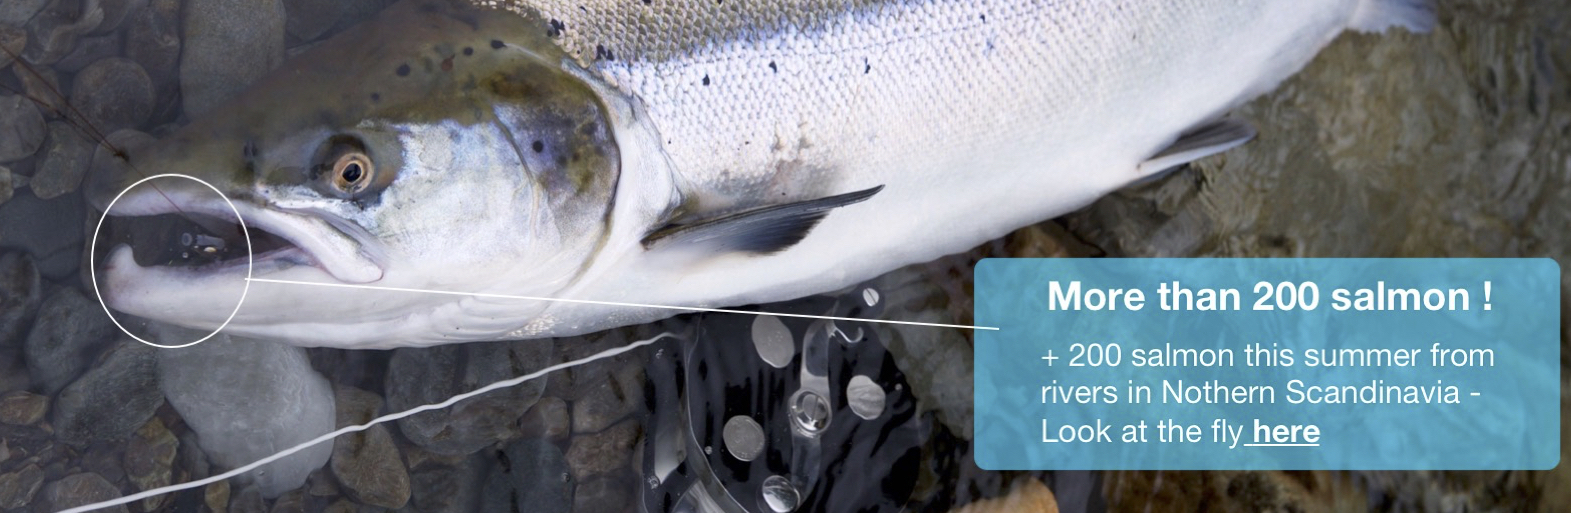 salmon on riffling hitch